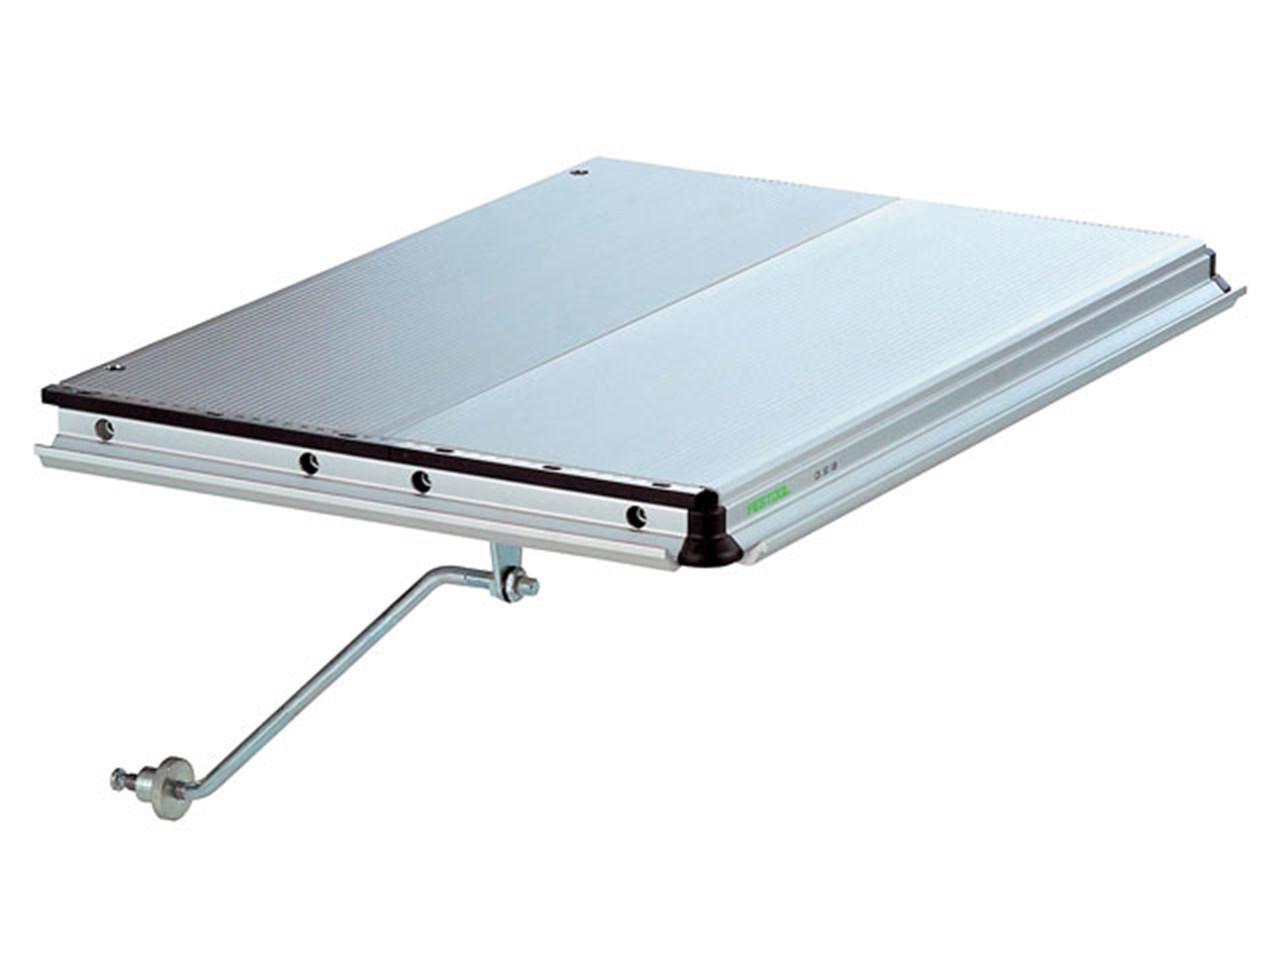 Festool 493822 extension table vb cms for Table festool